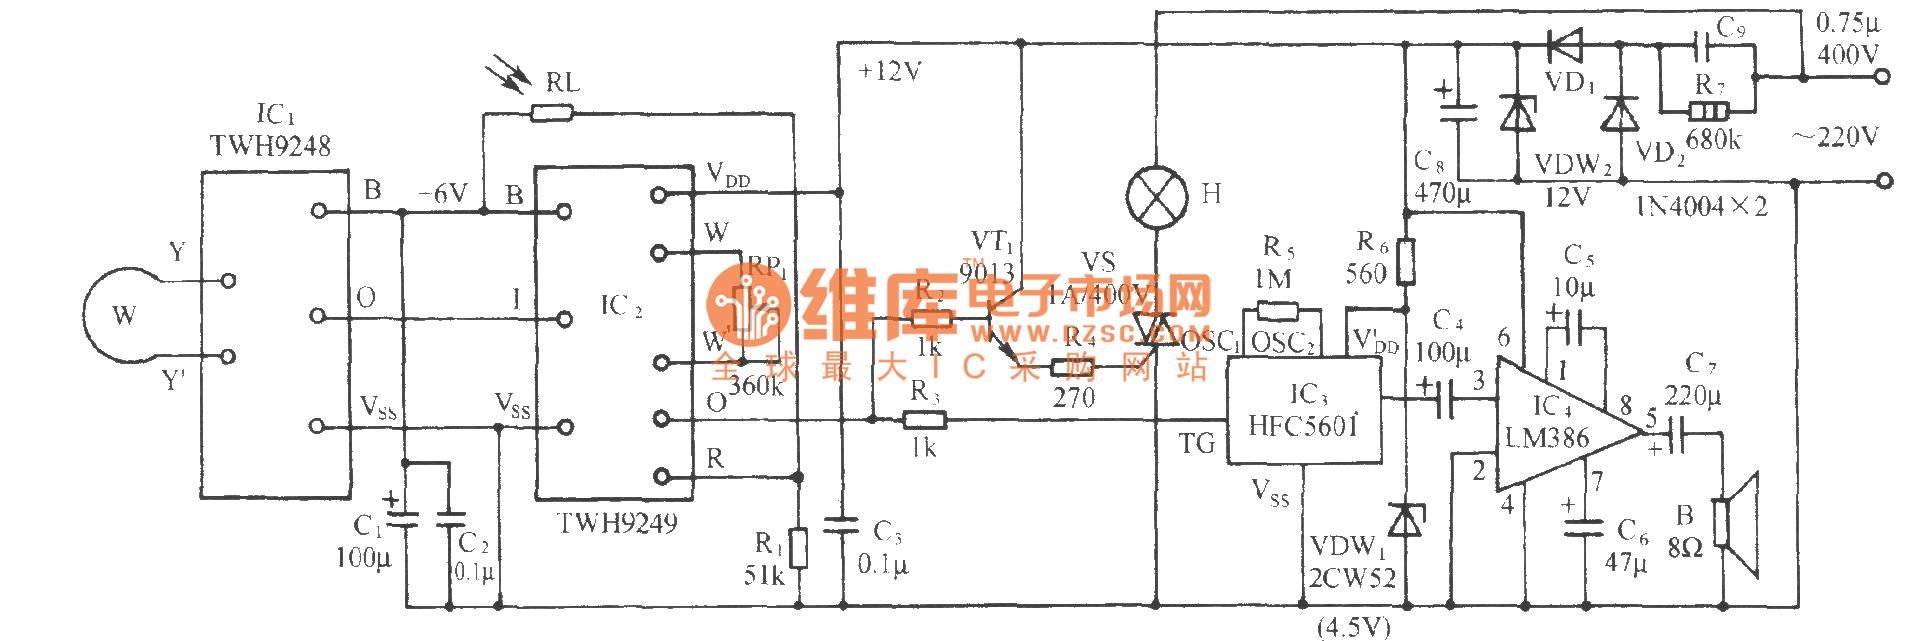 The Demon Daming Curse Audio Circuit Of Scan Detection Type Power Amplifier Audiocircuit Diagram Seekiccom